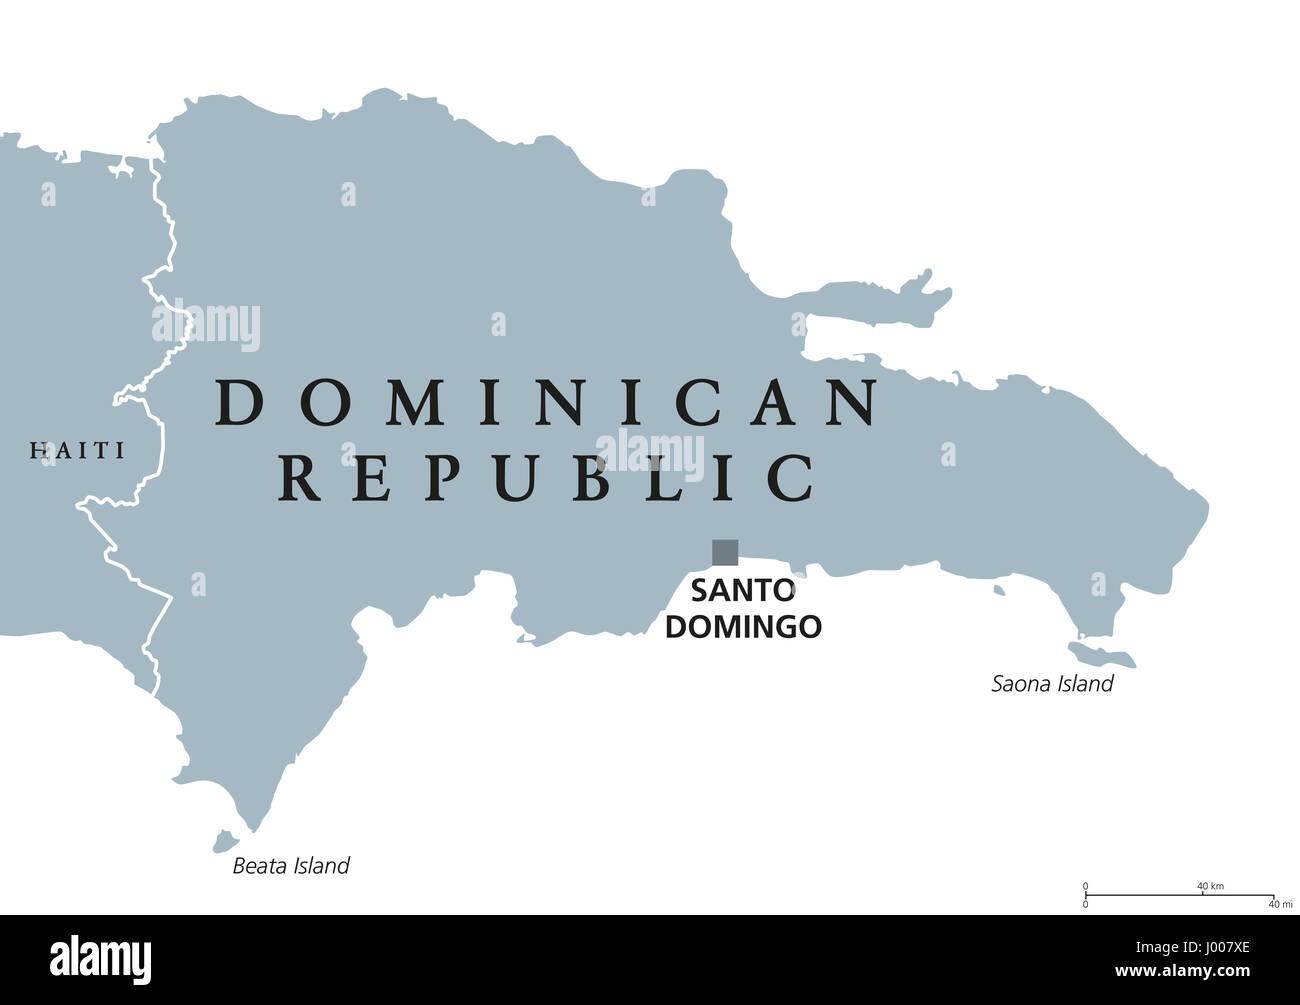 Dominican Republic Political Map With Capital Santo Domingo Stock - Santo domingo map